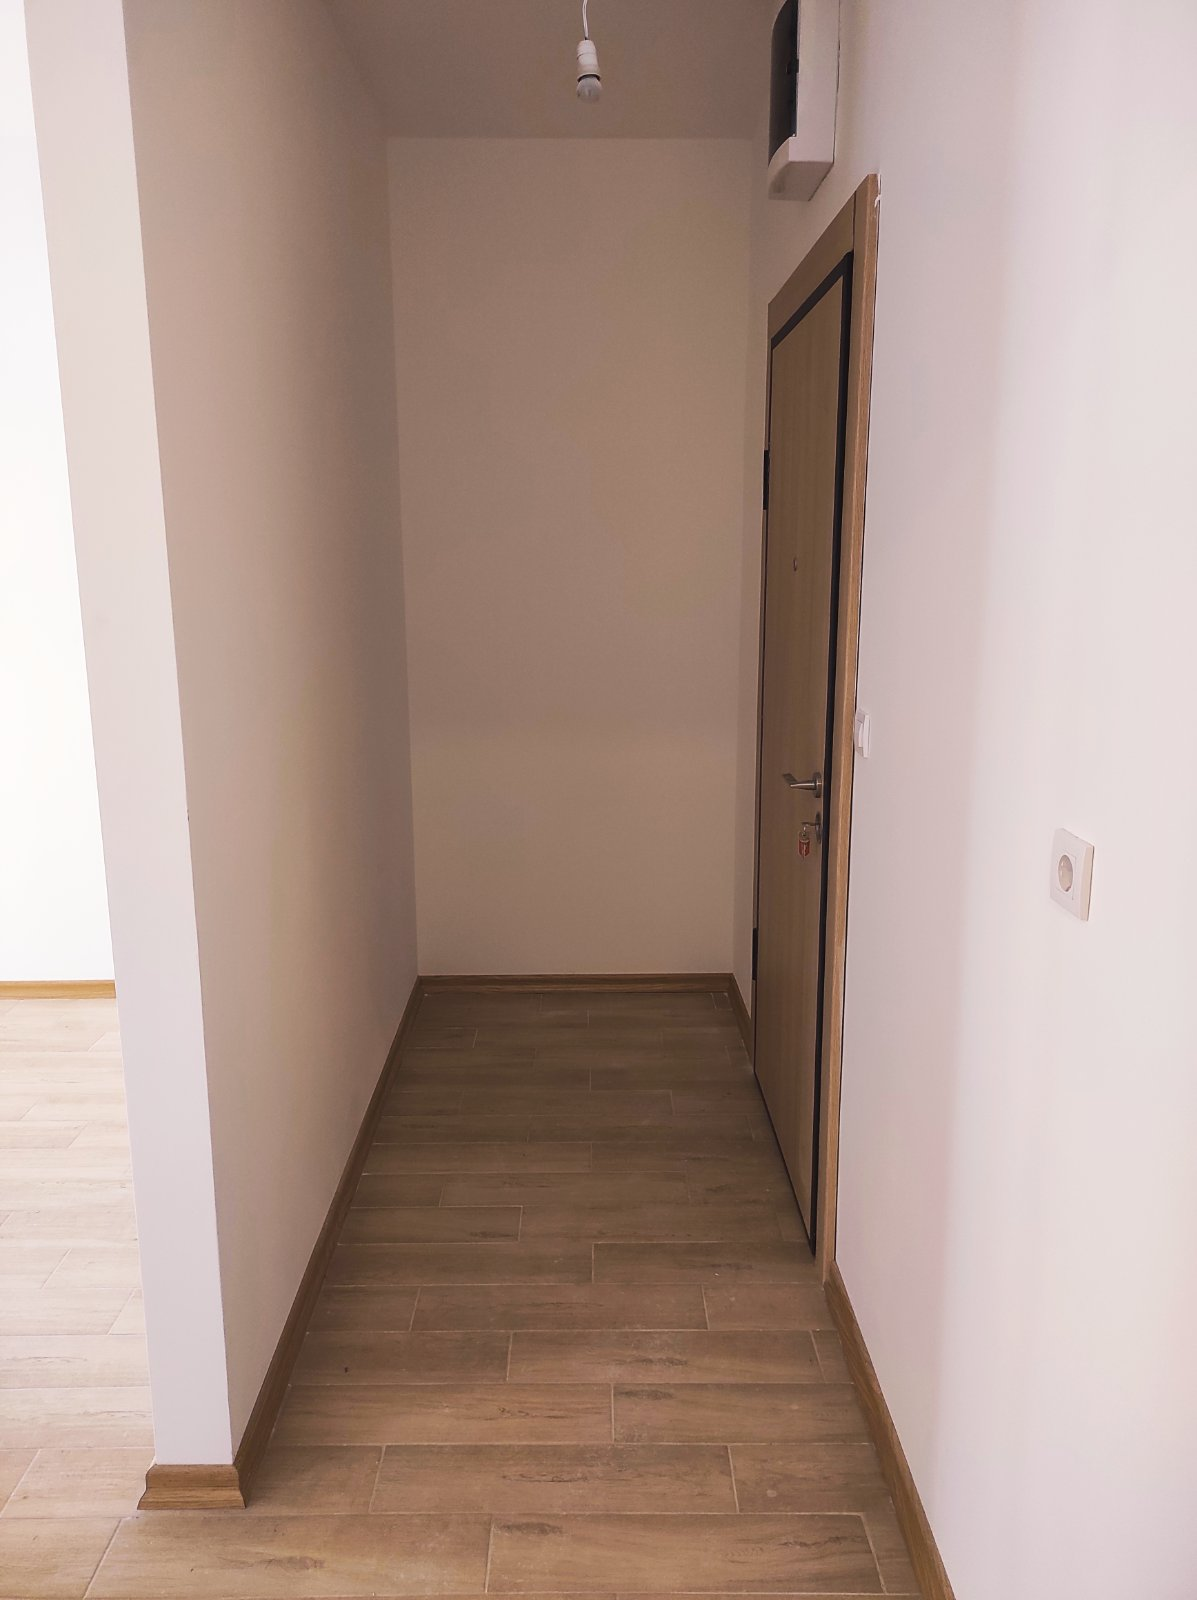 amforaproperty.com/Garsonjera Old Bakery 31m2 +28m2 terasa+ garažno mjesto. 73.000€